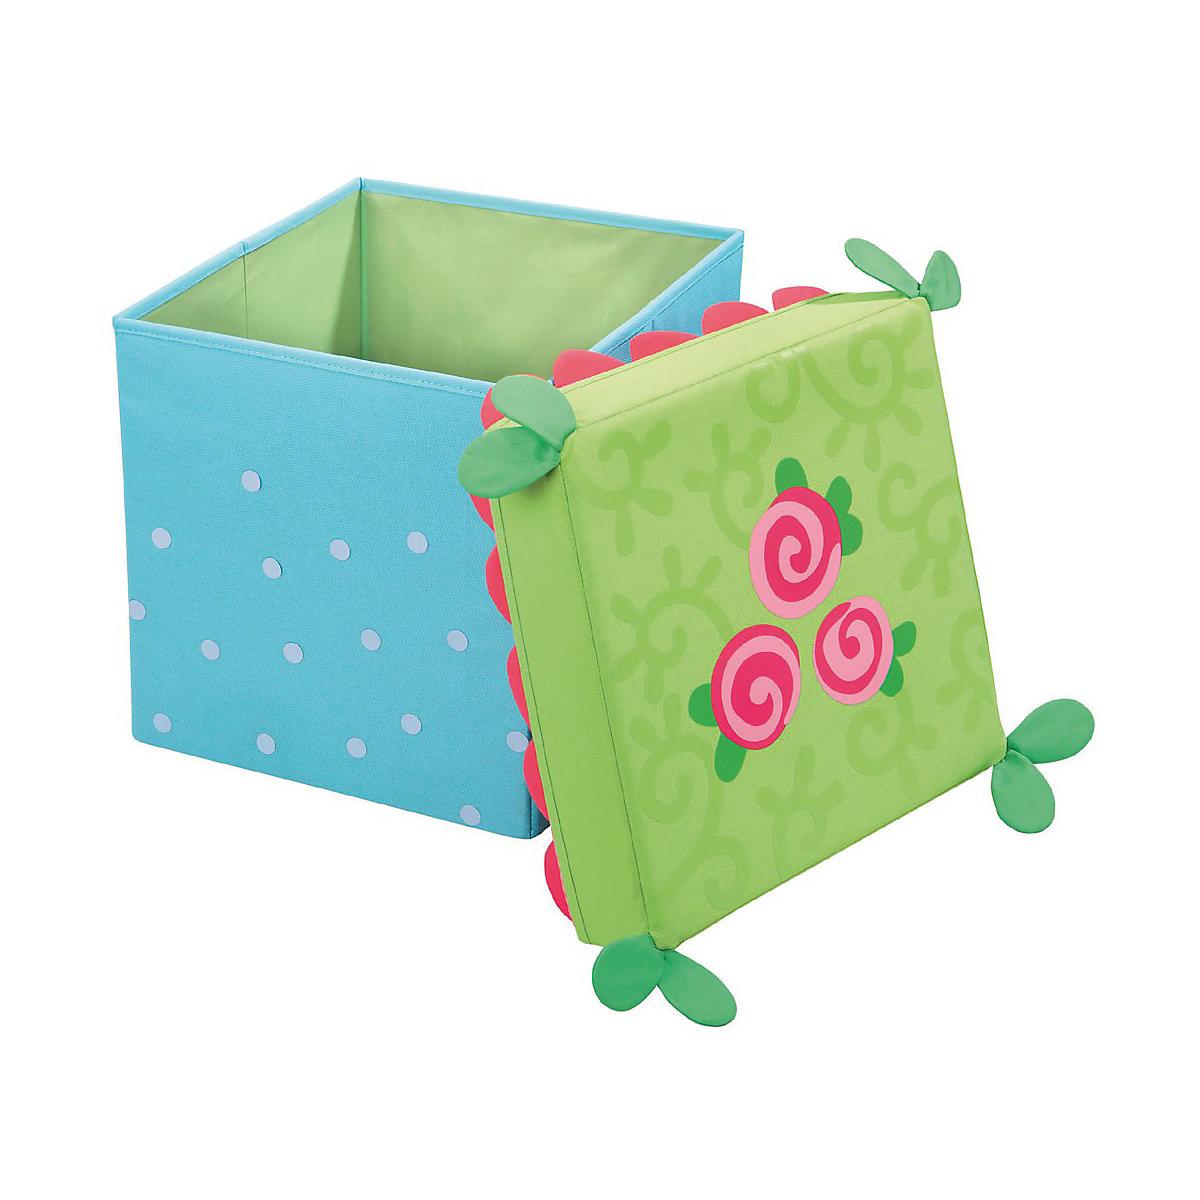 sitzw rfel aufbewahrungsbox rosenfee haba mytoys. Black Bedroom Furniture Sets. Home Design Ideas